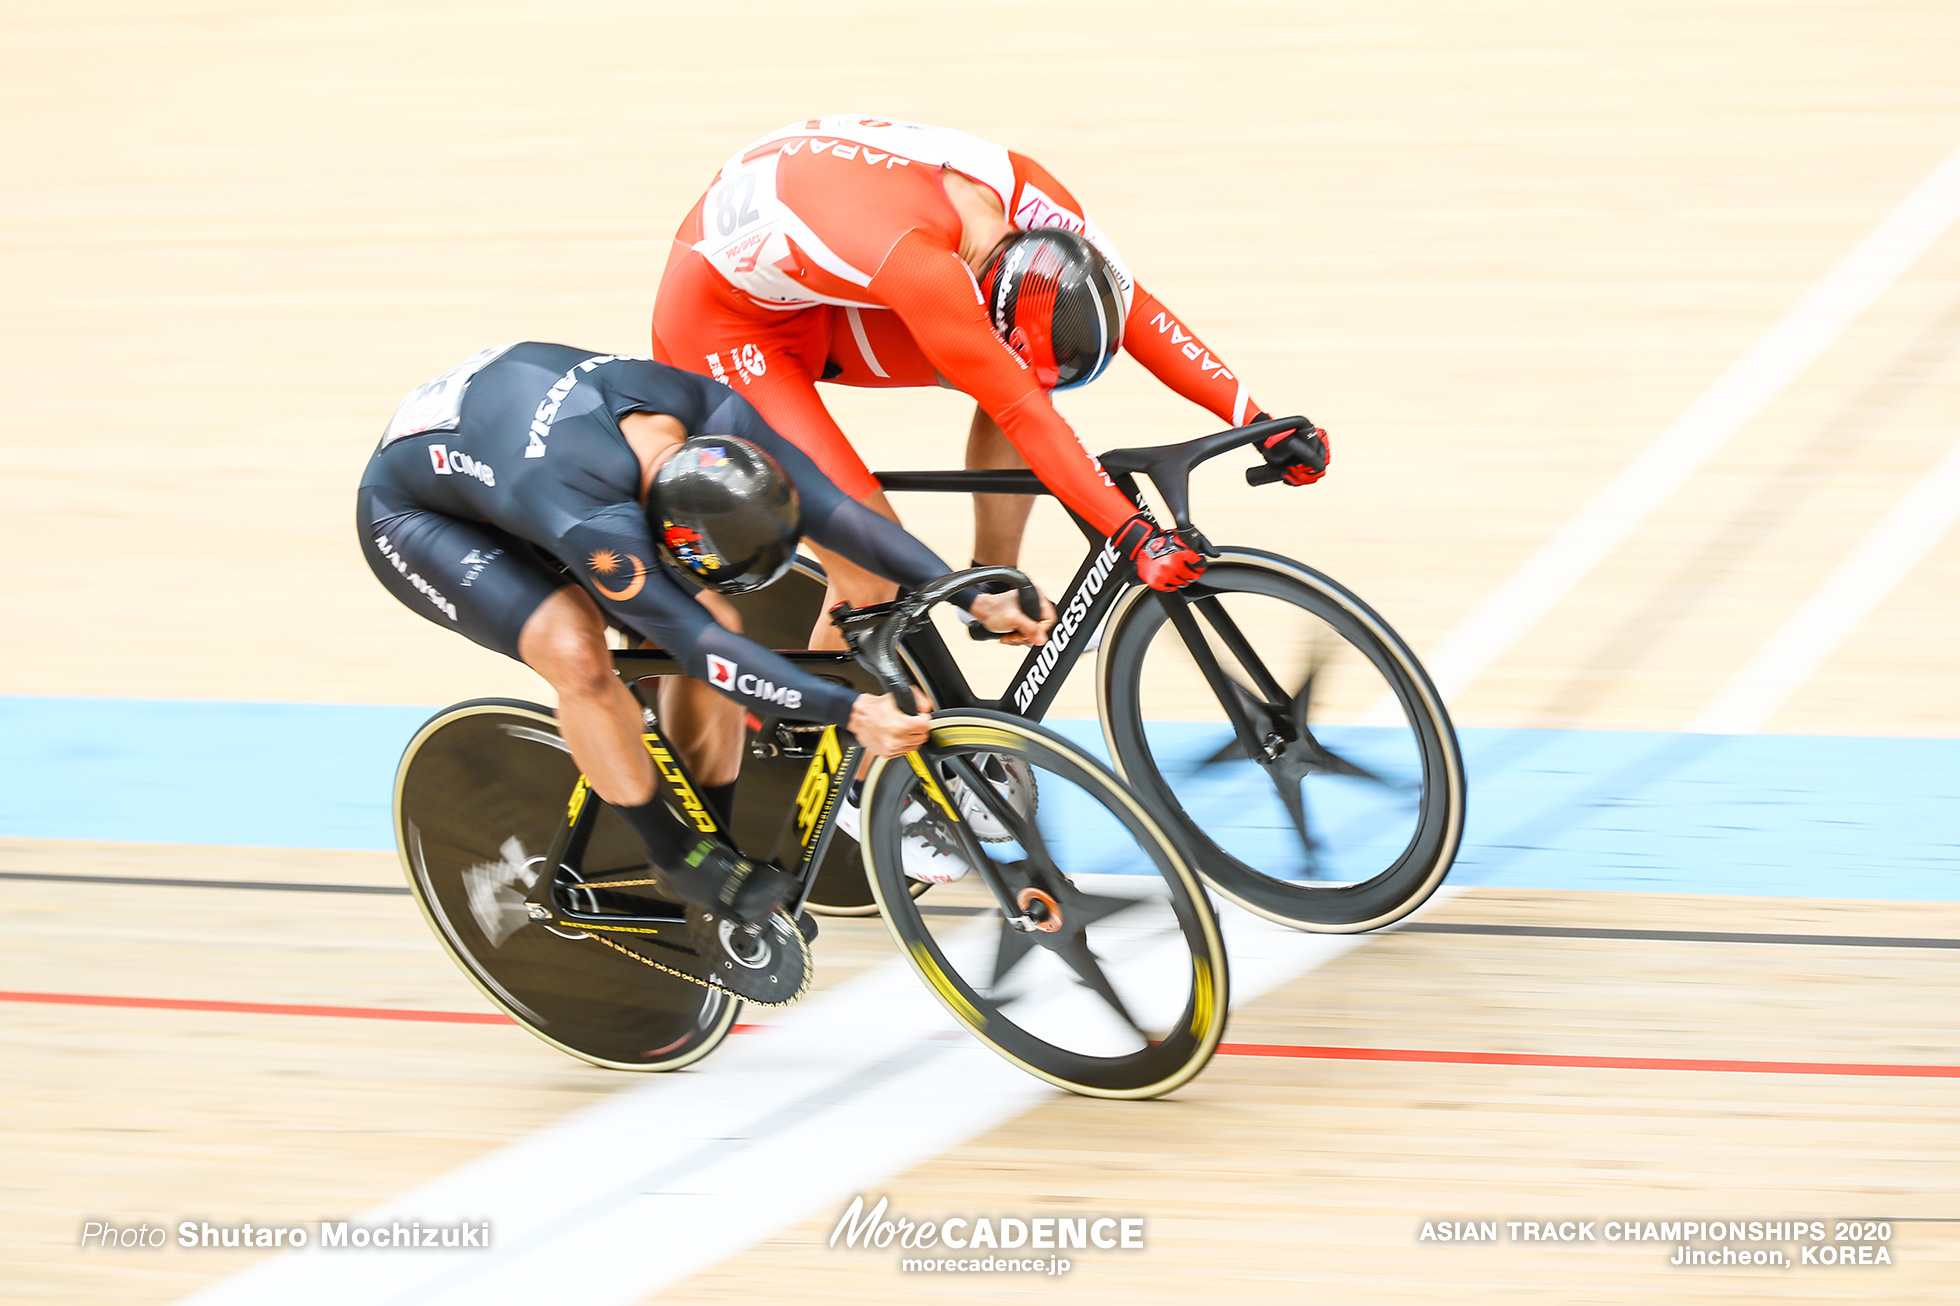 Final for Gold / Men Sprint/ ASIAN TRACK CHAMPIONSHIPS 2020